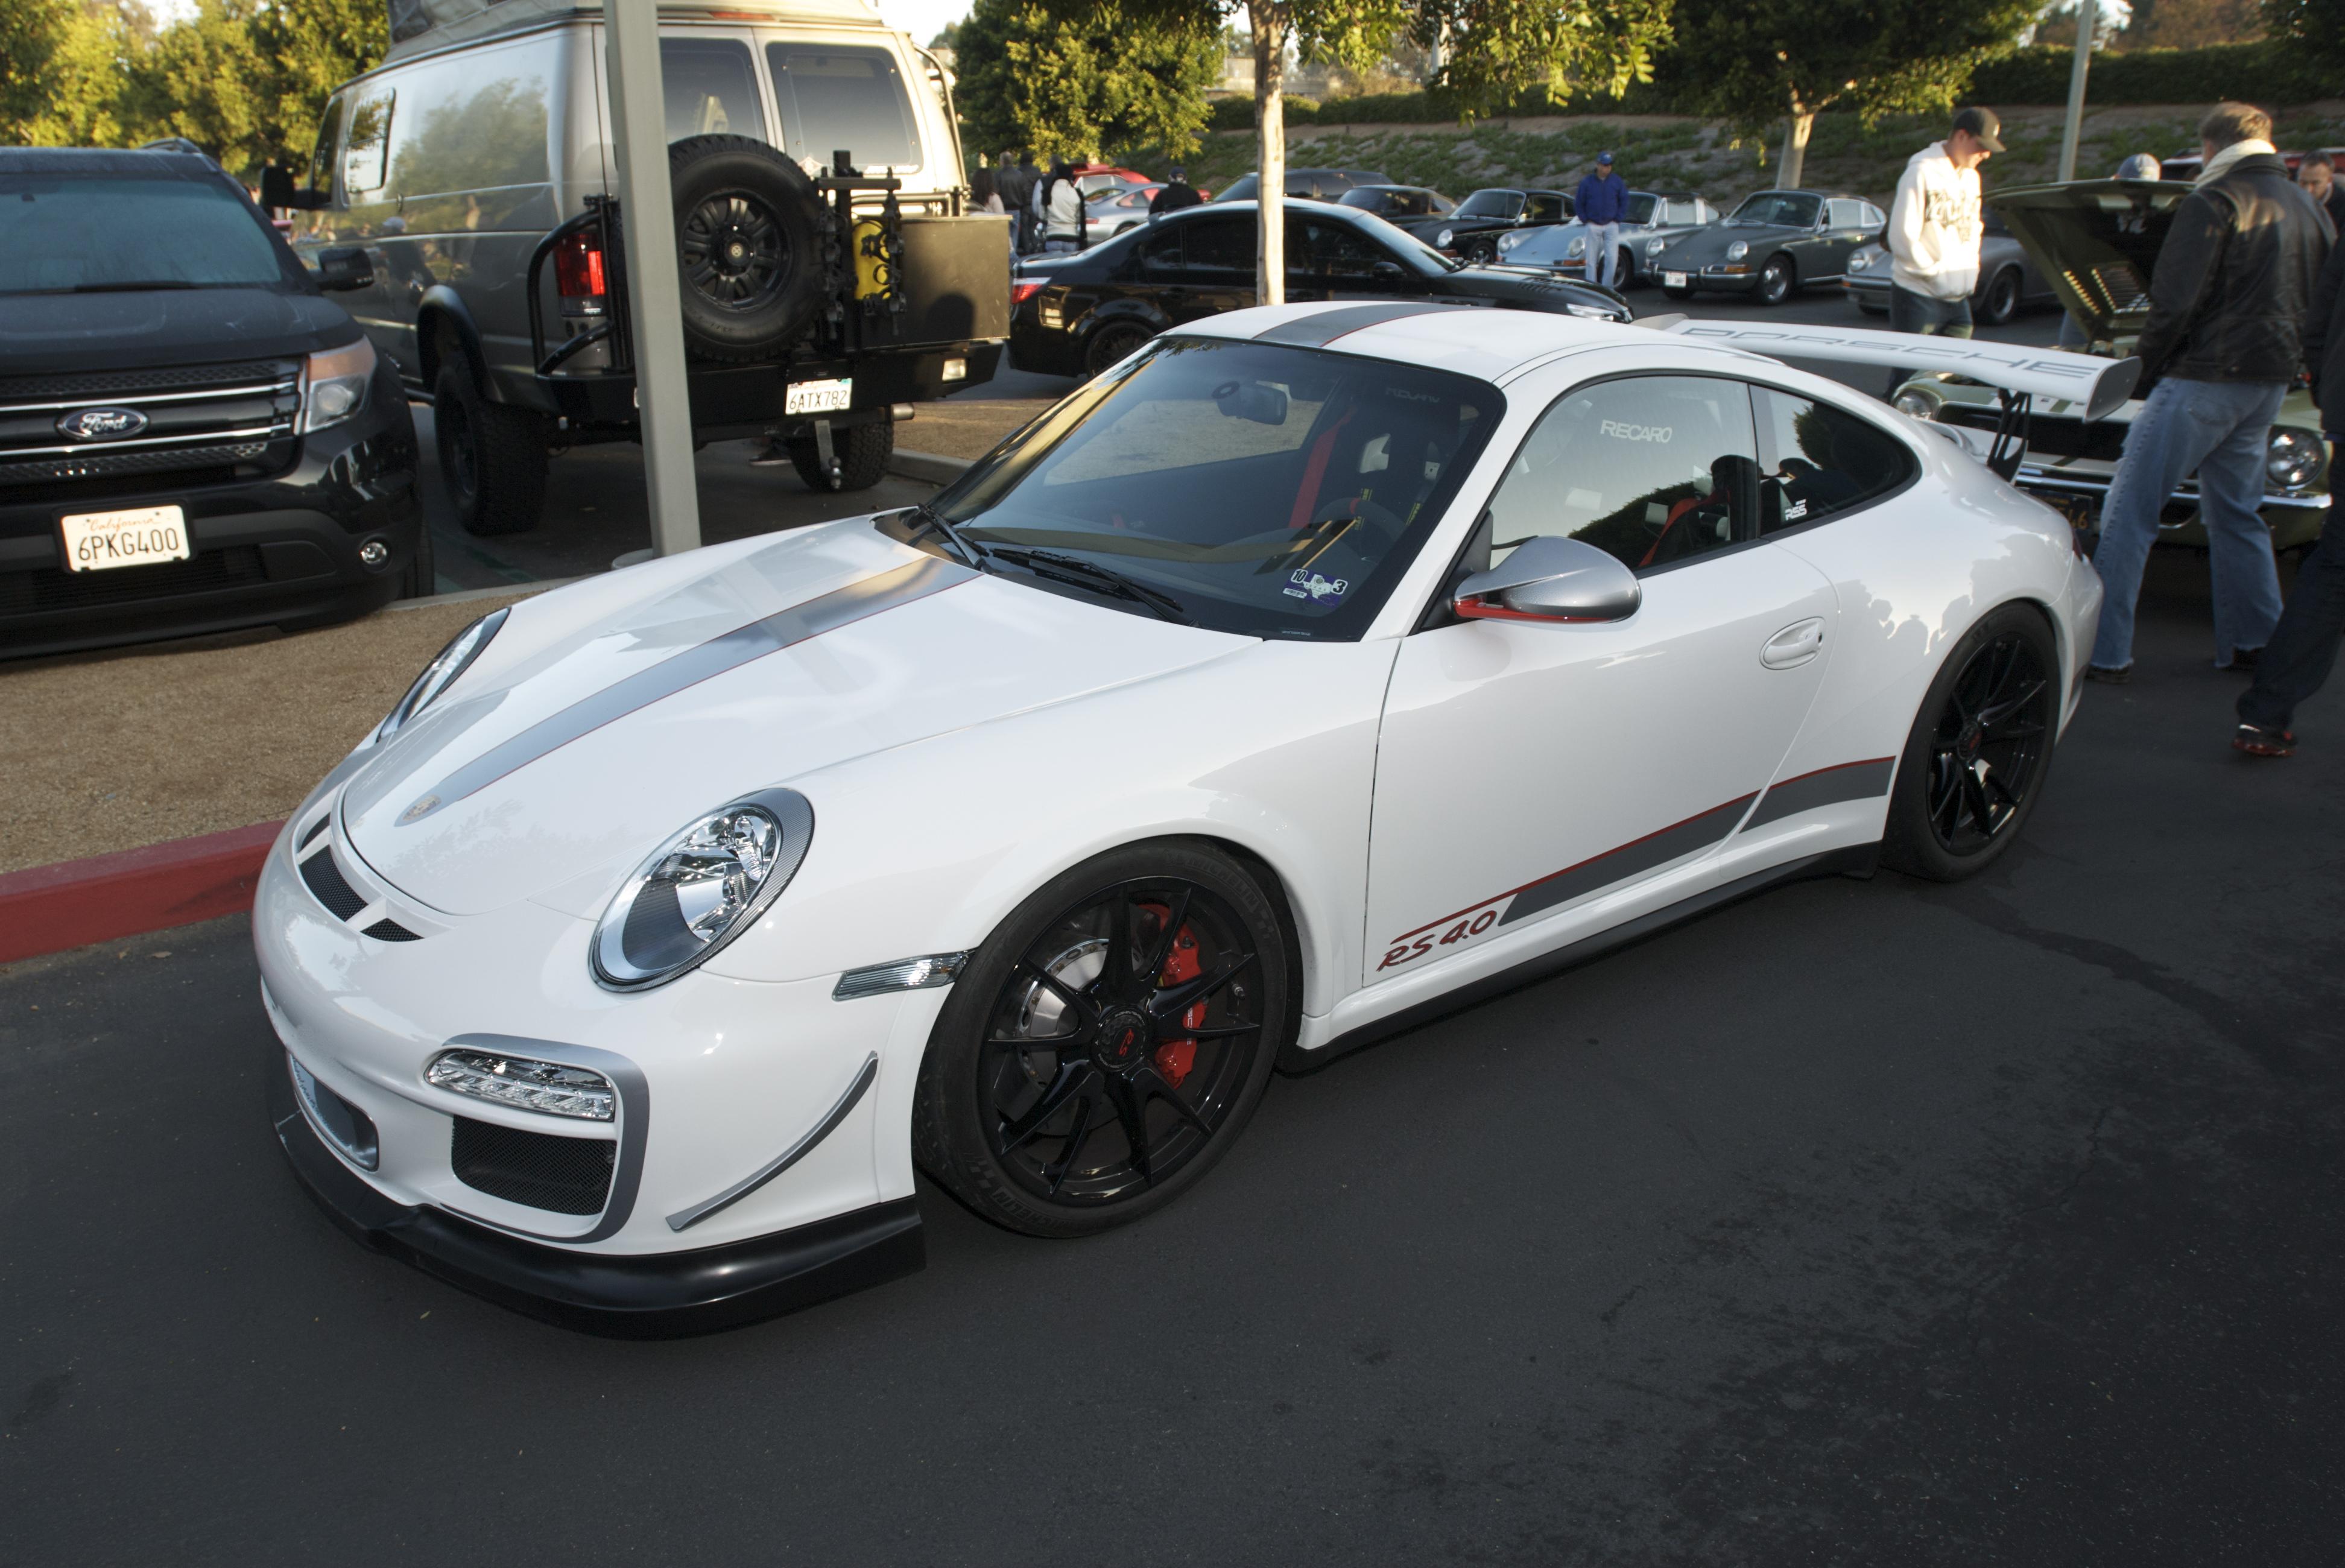 997 Rs 4 0 Stripes Rennlist Porsche Discussion Forums